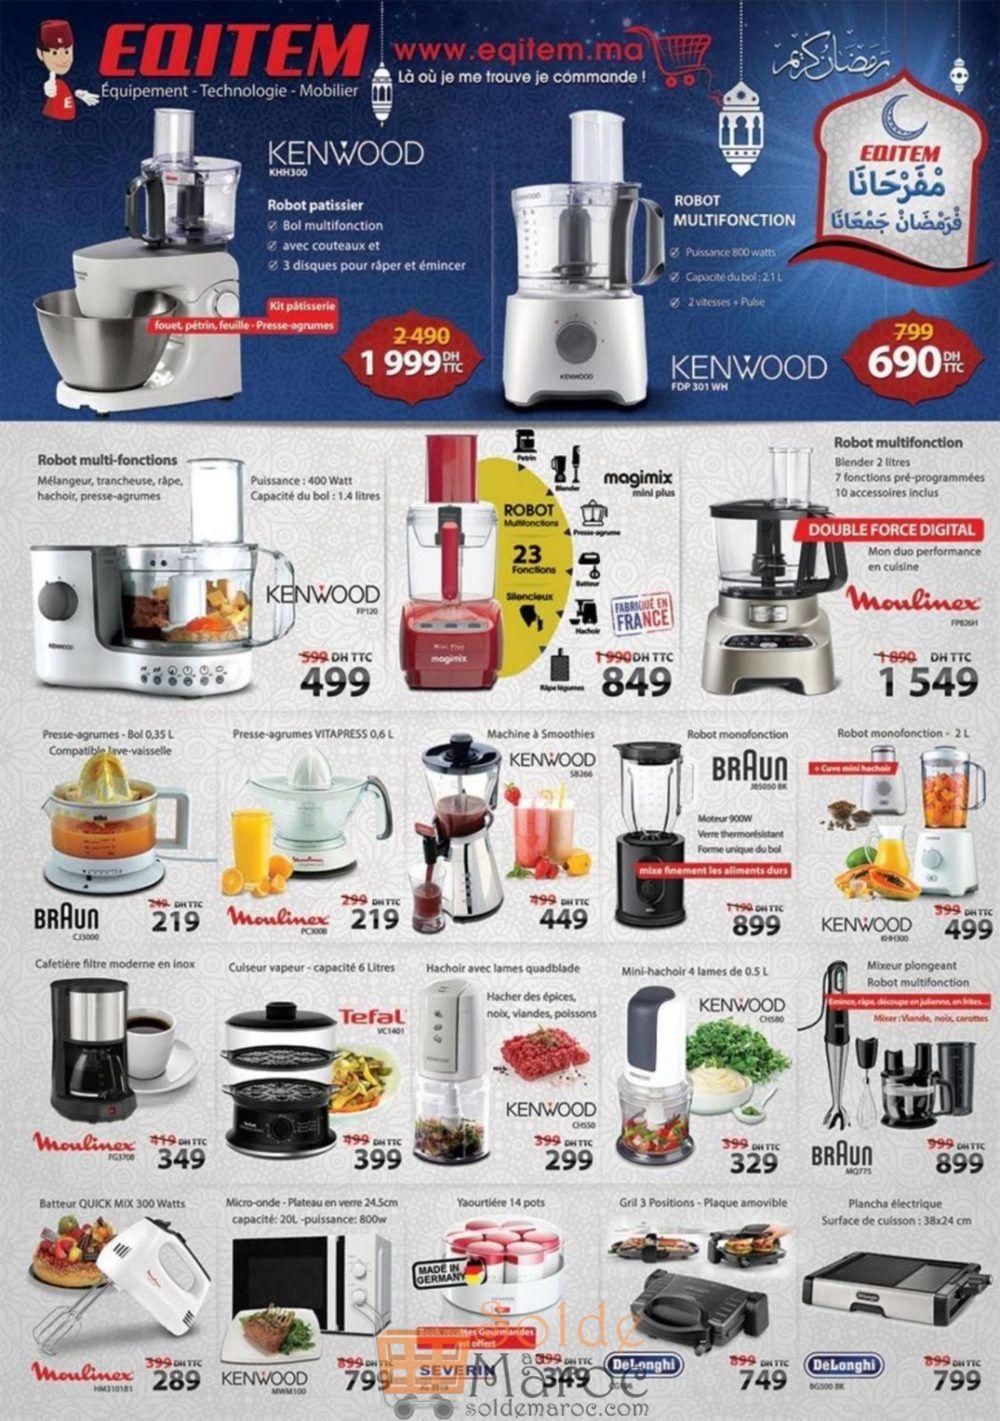 Catalogue Eqitem Ramadan Jusqu'au 2 Juin 2018